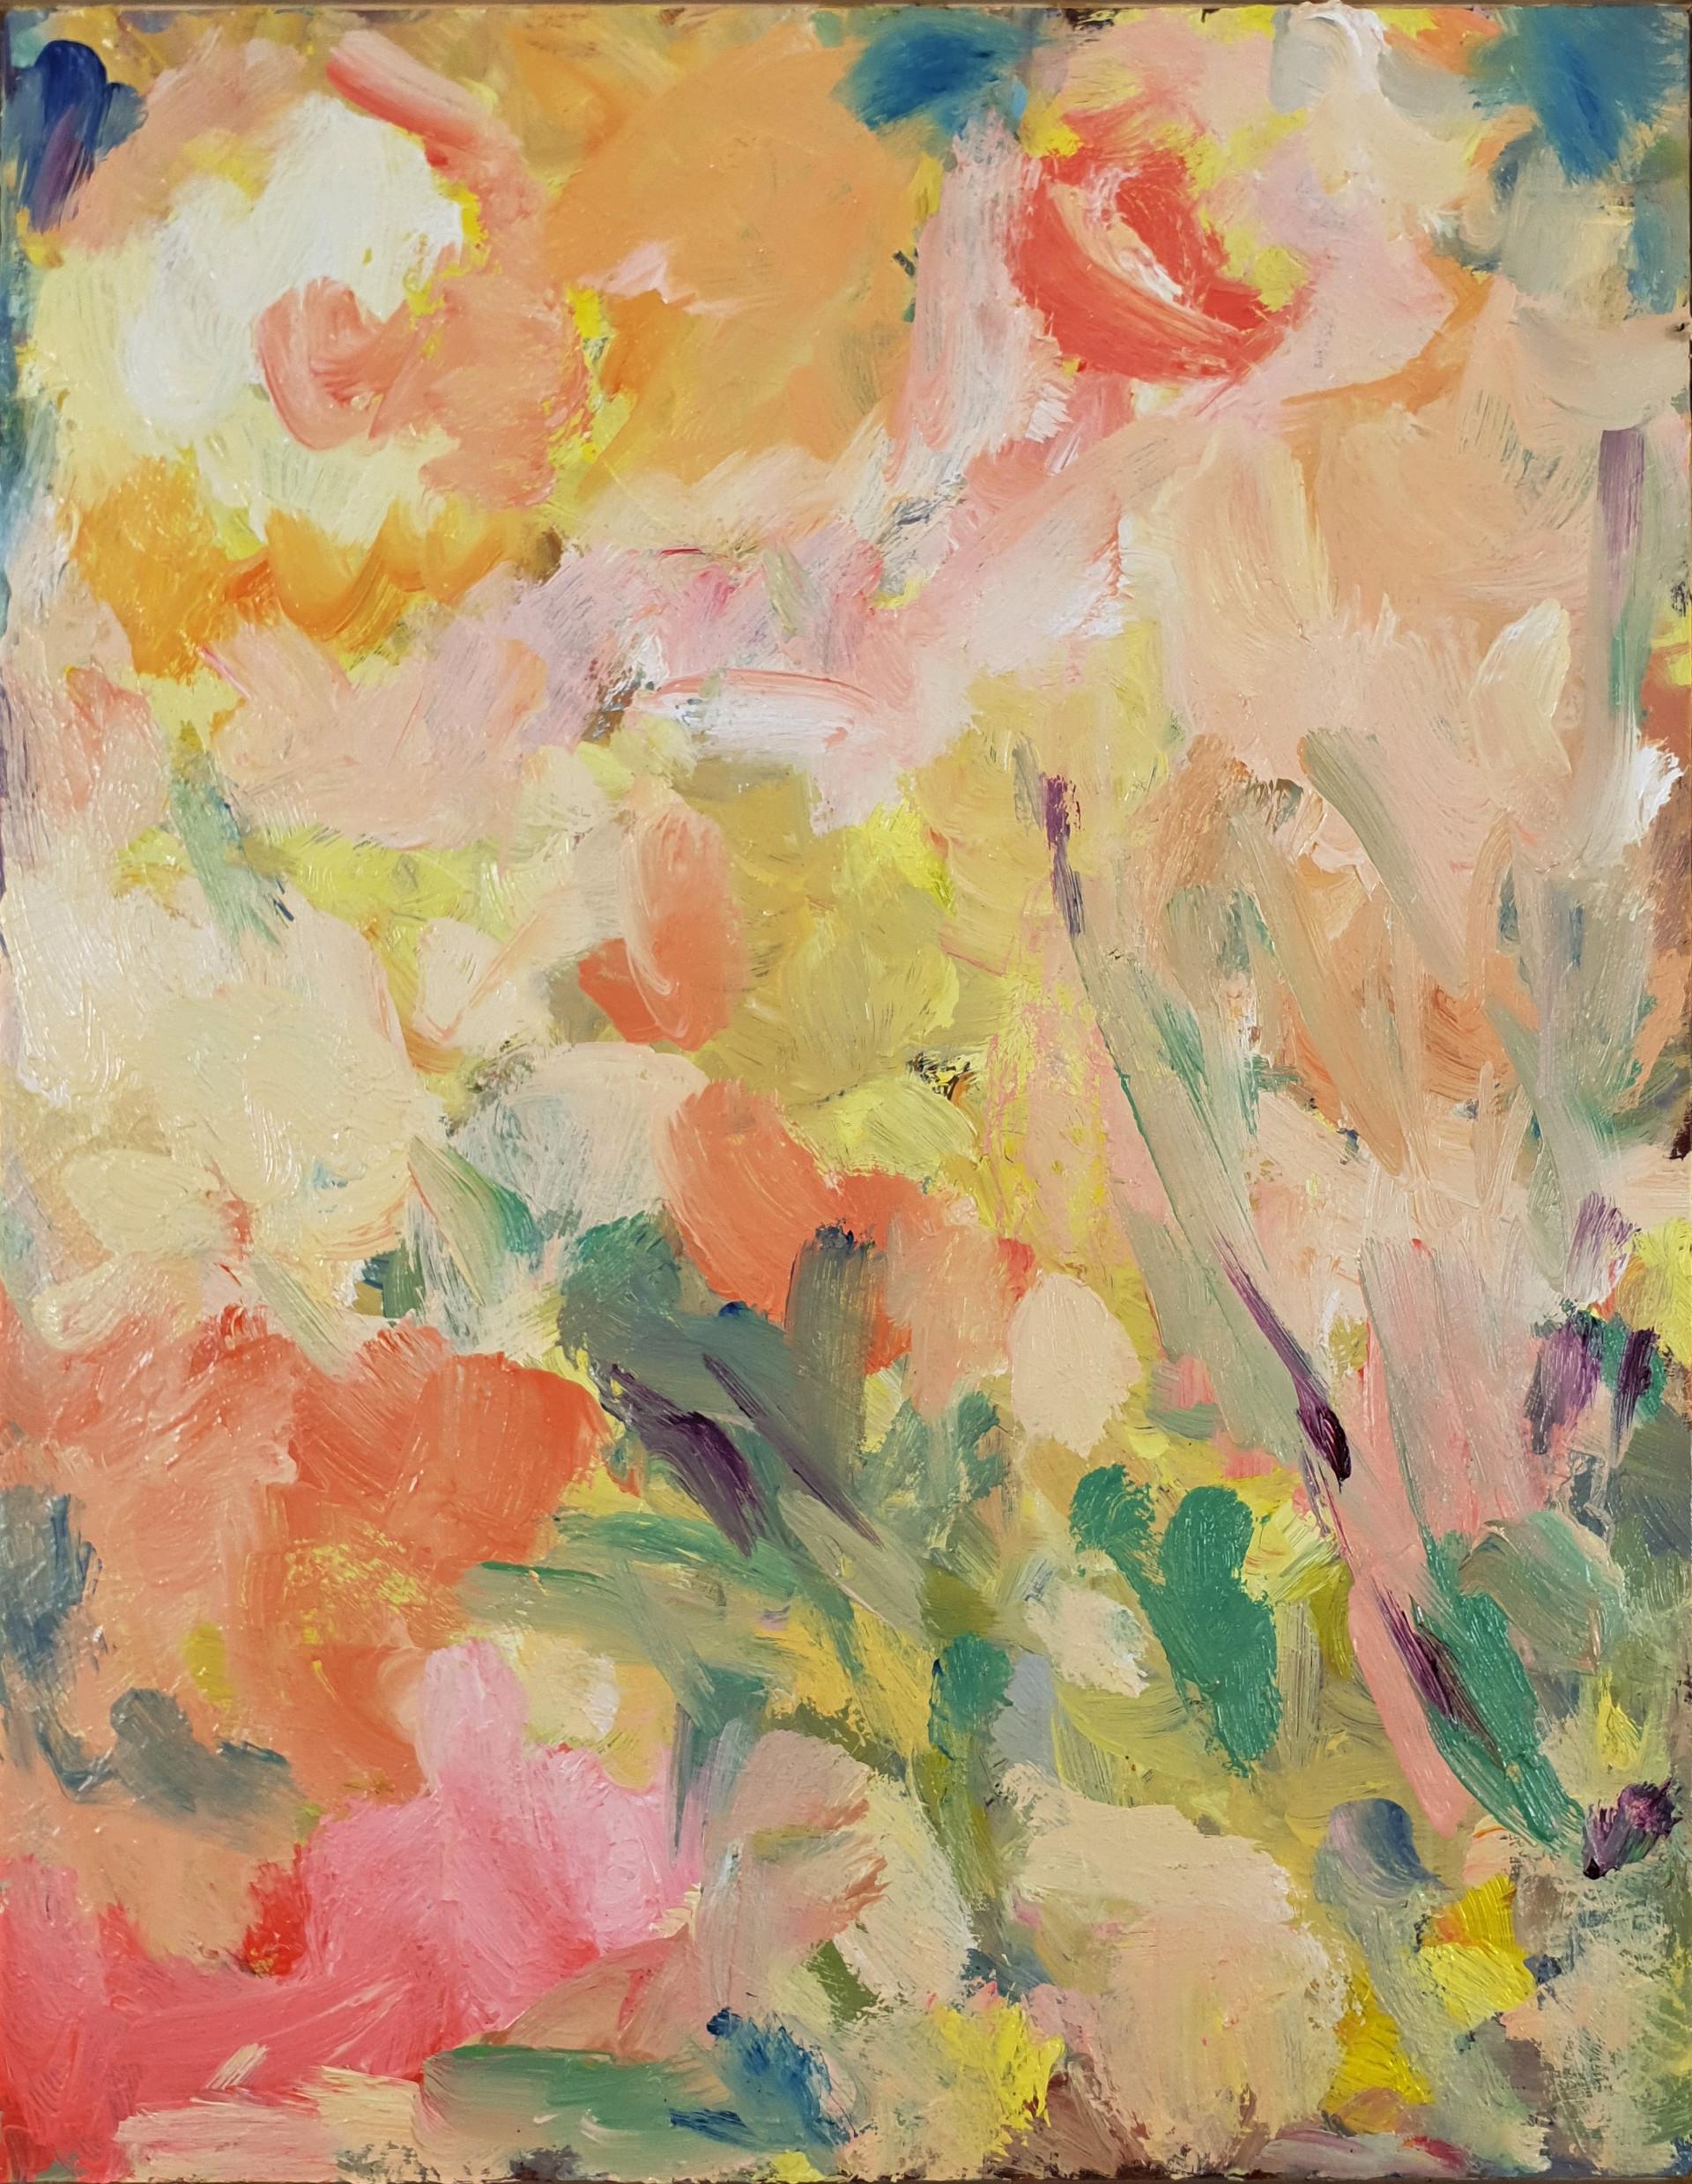 14. Impression: Summer Flowers